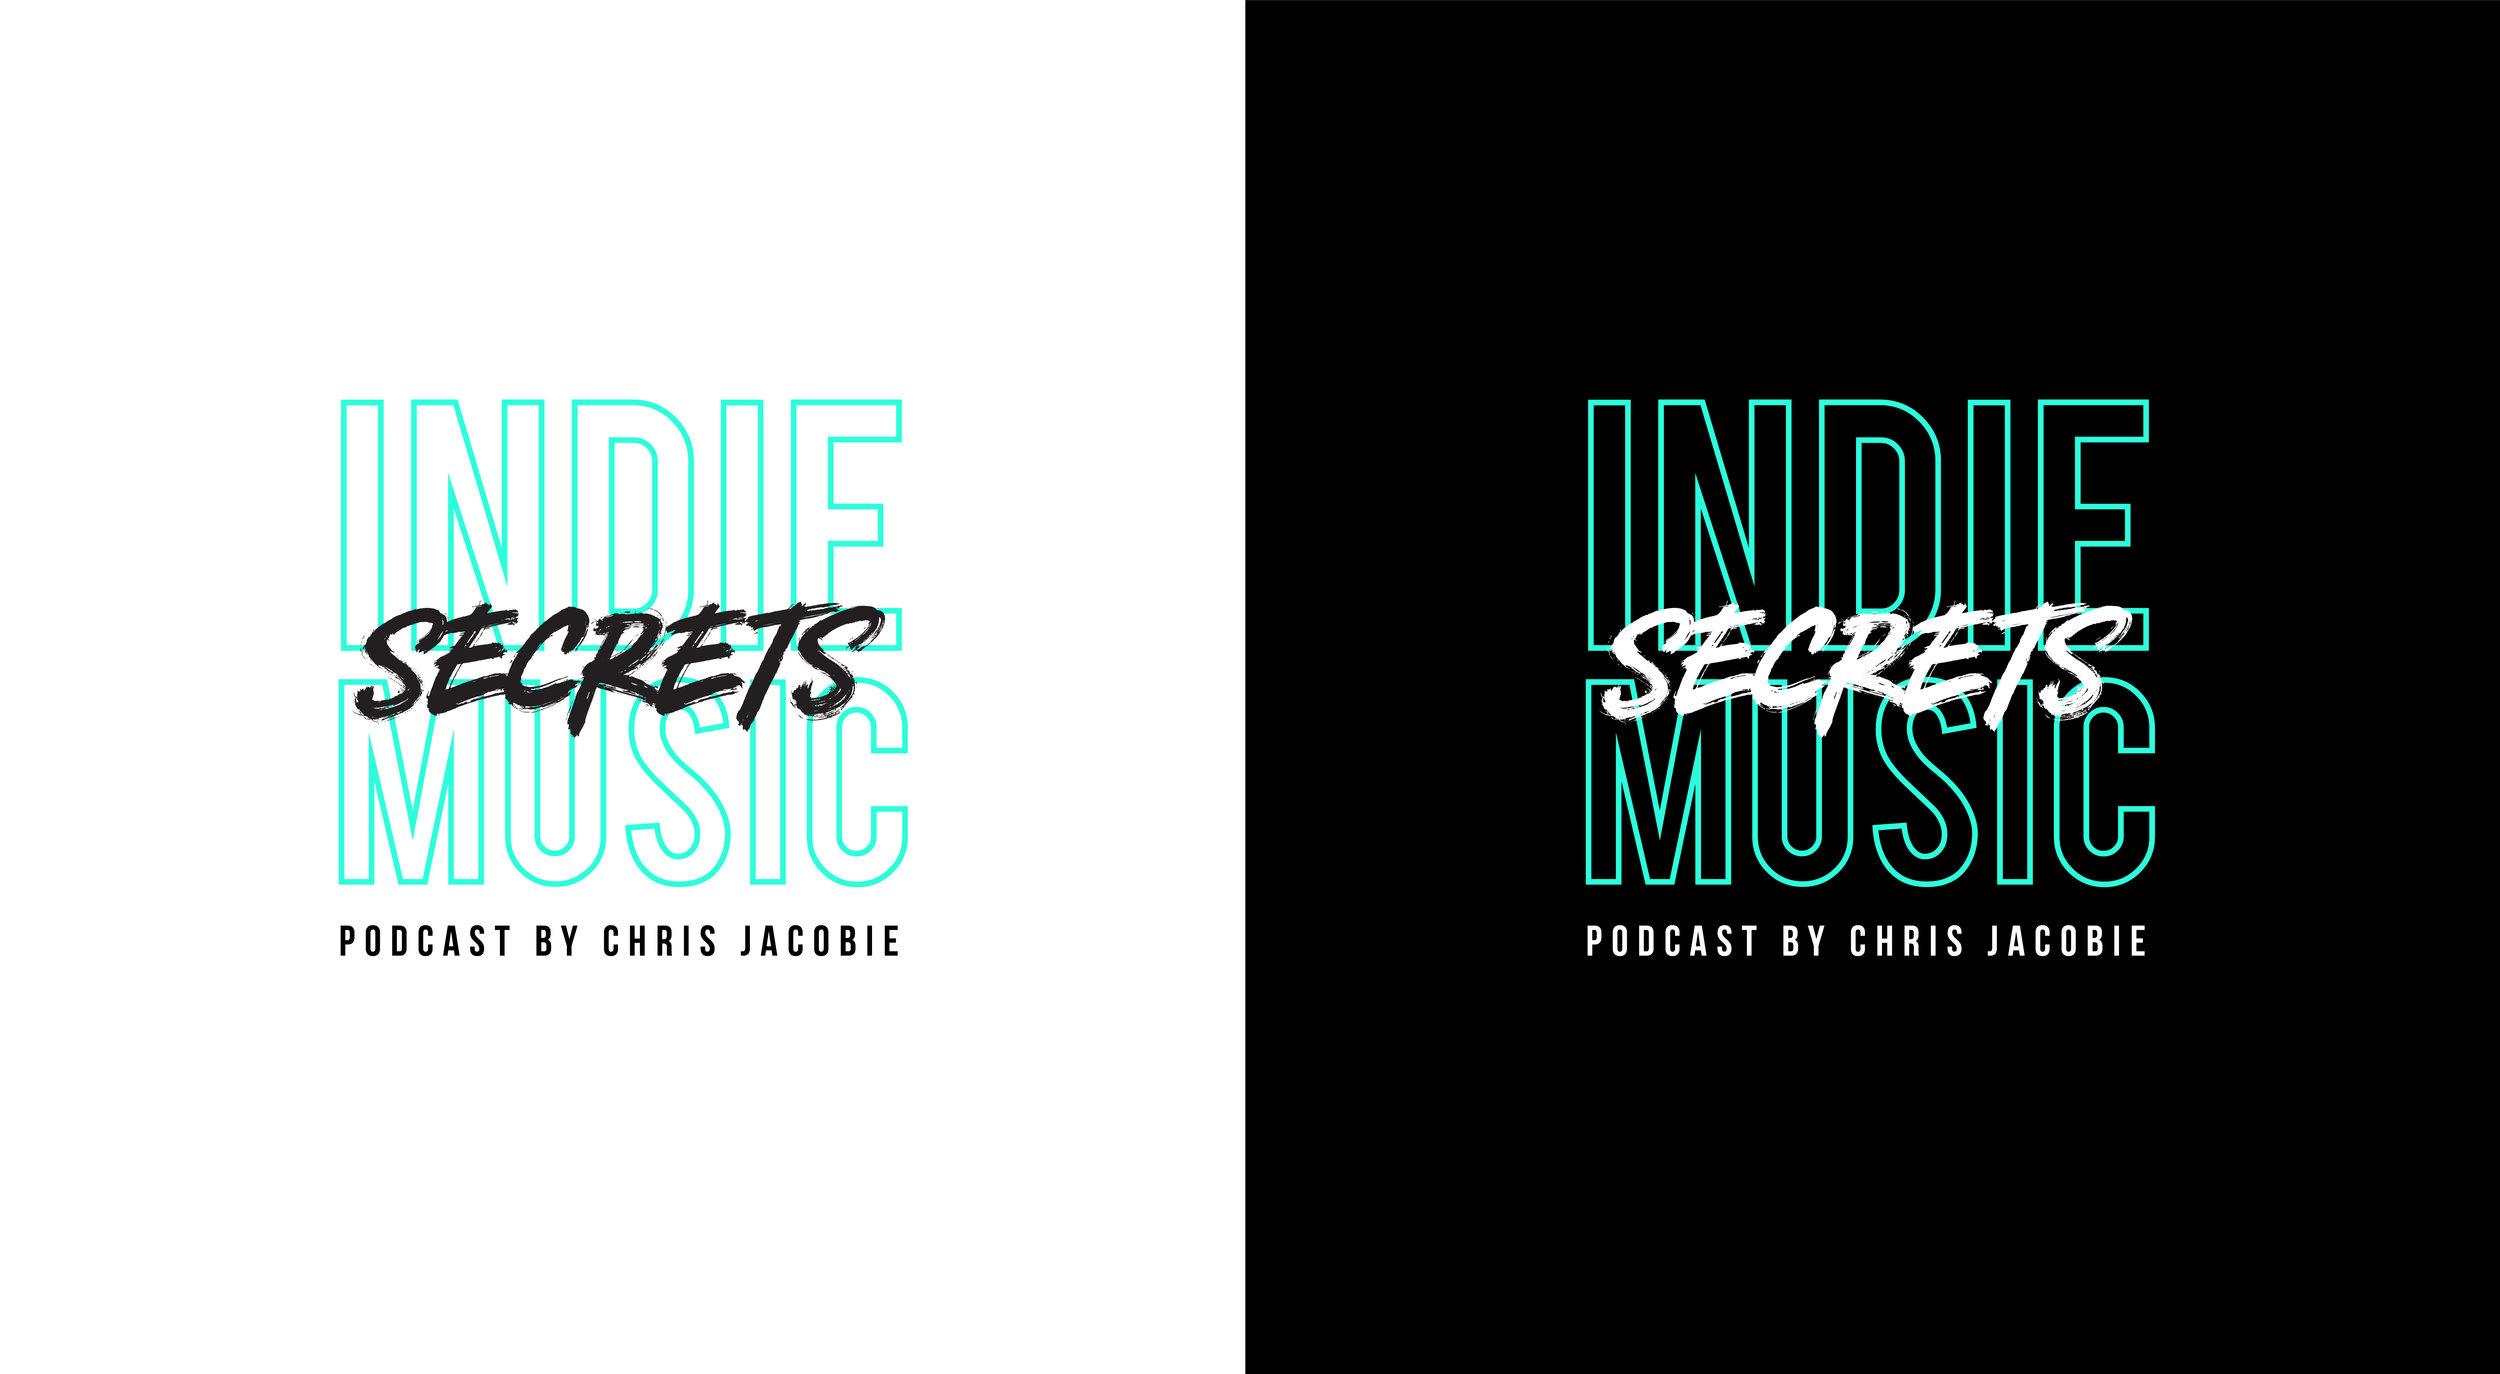 IndieMusicSecrets_Logo-01.jpg